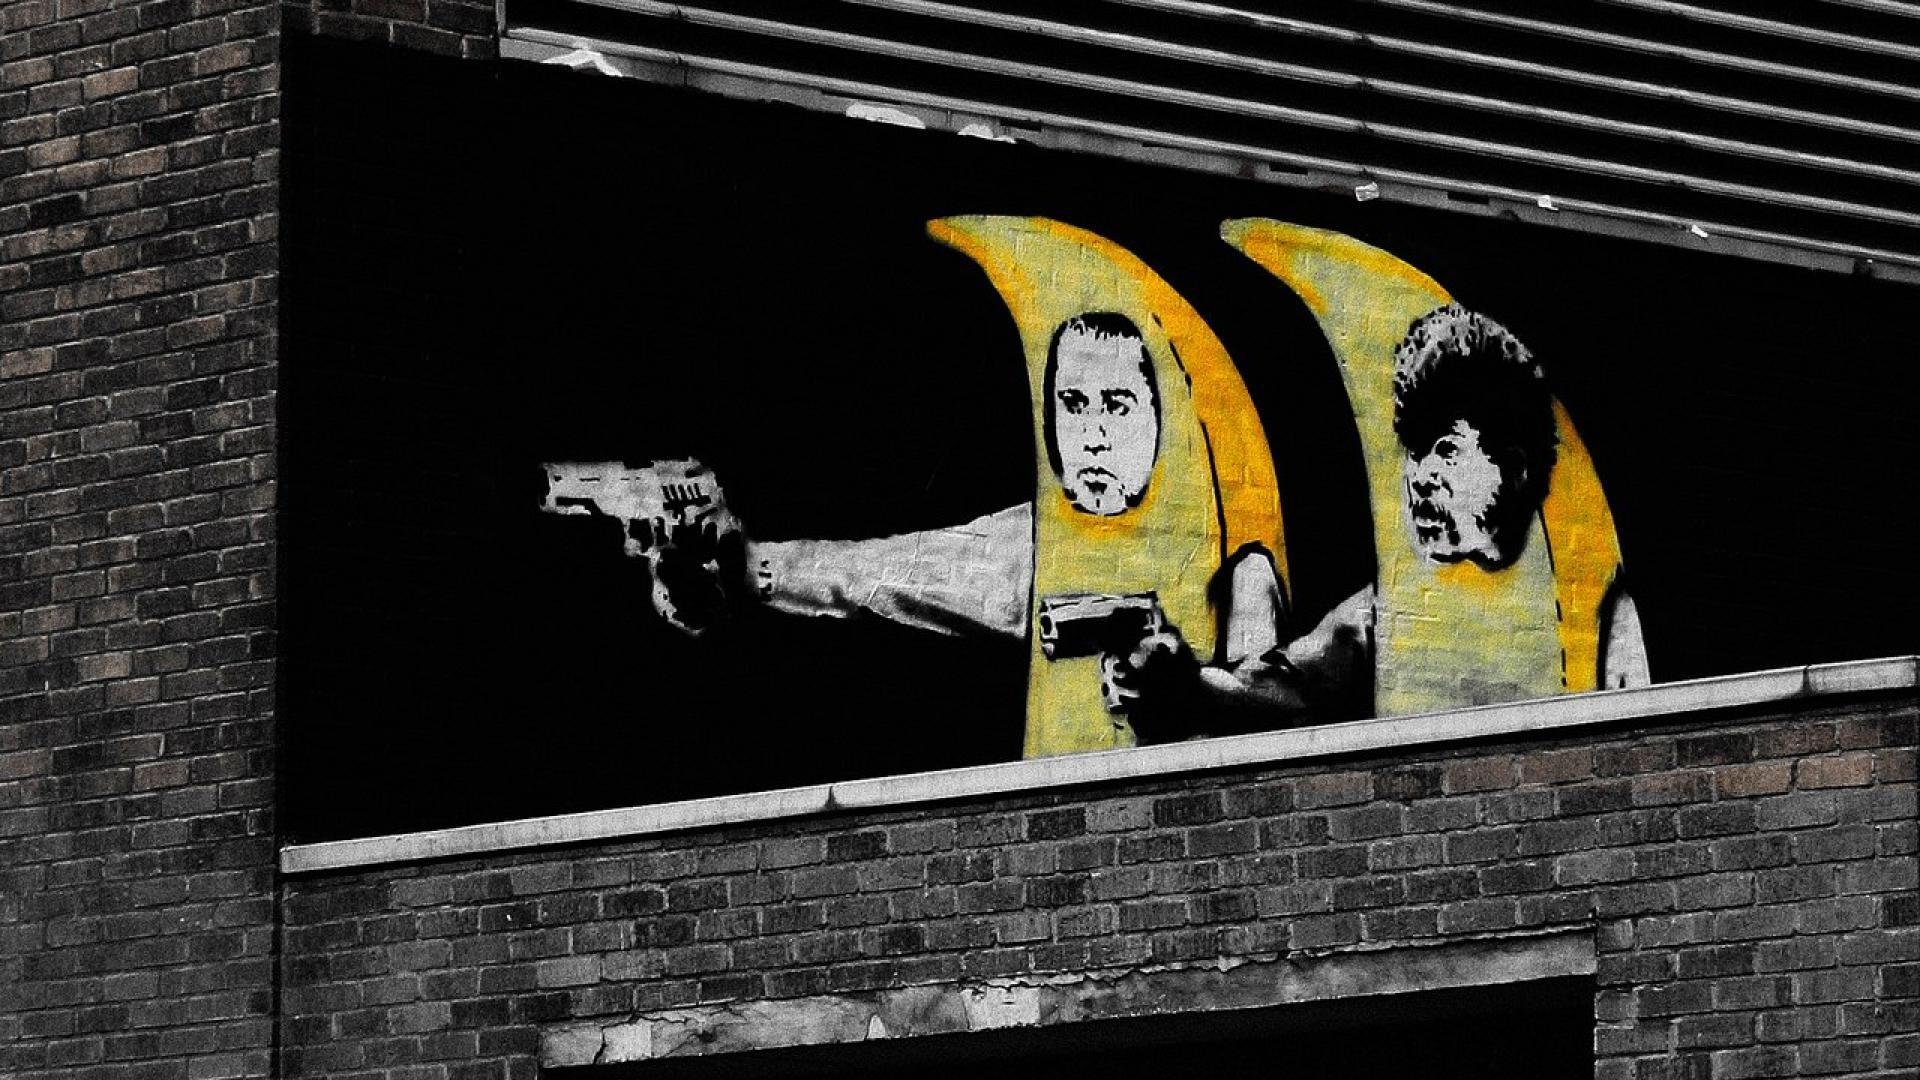 Banksy Hd Wallpaper: Banksy Hd Wallpaper